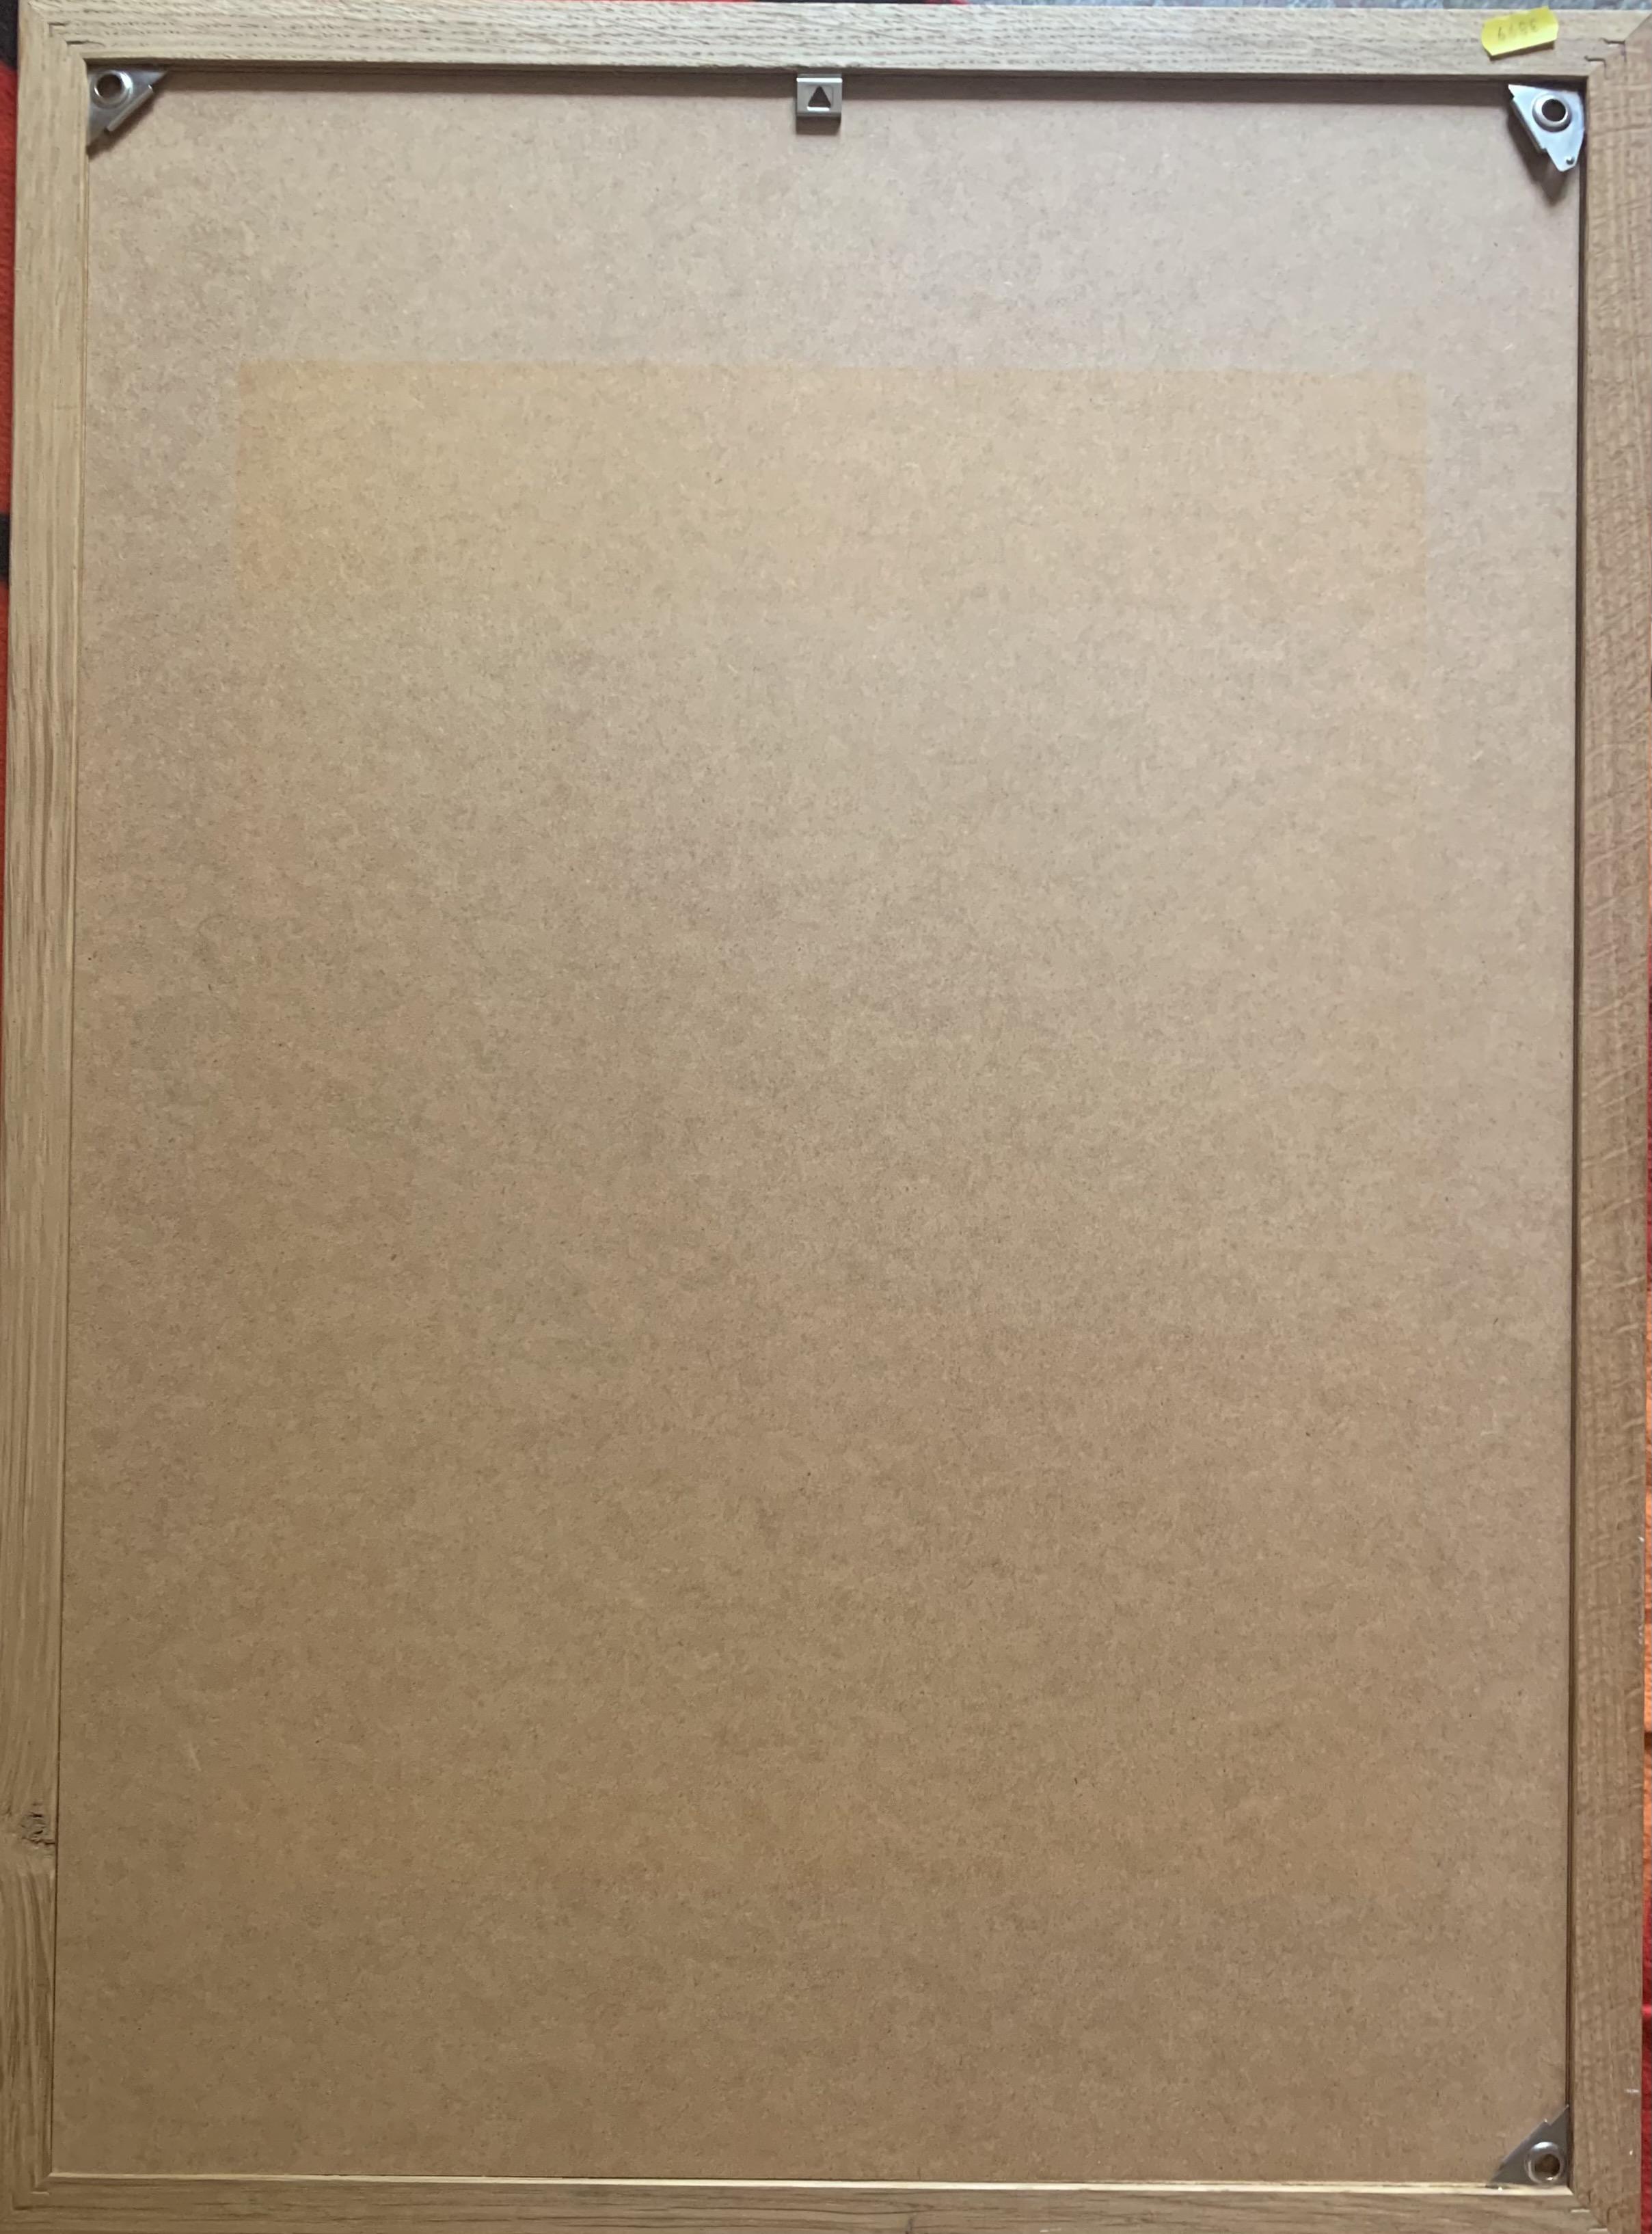 "Advertising poster – La Mauny, Rhum Blanc Agricole, Martinique. Image 18"" x 26"", frame 21.5"" x 29. - Image 2 of 2"